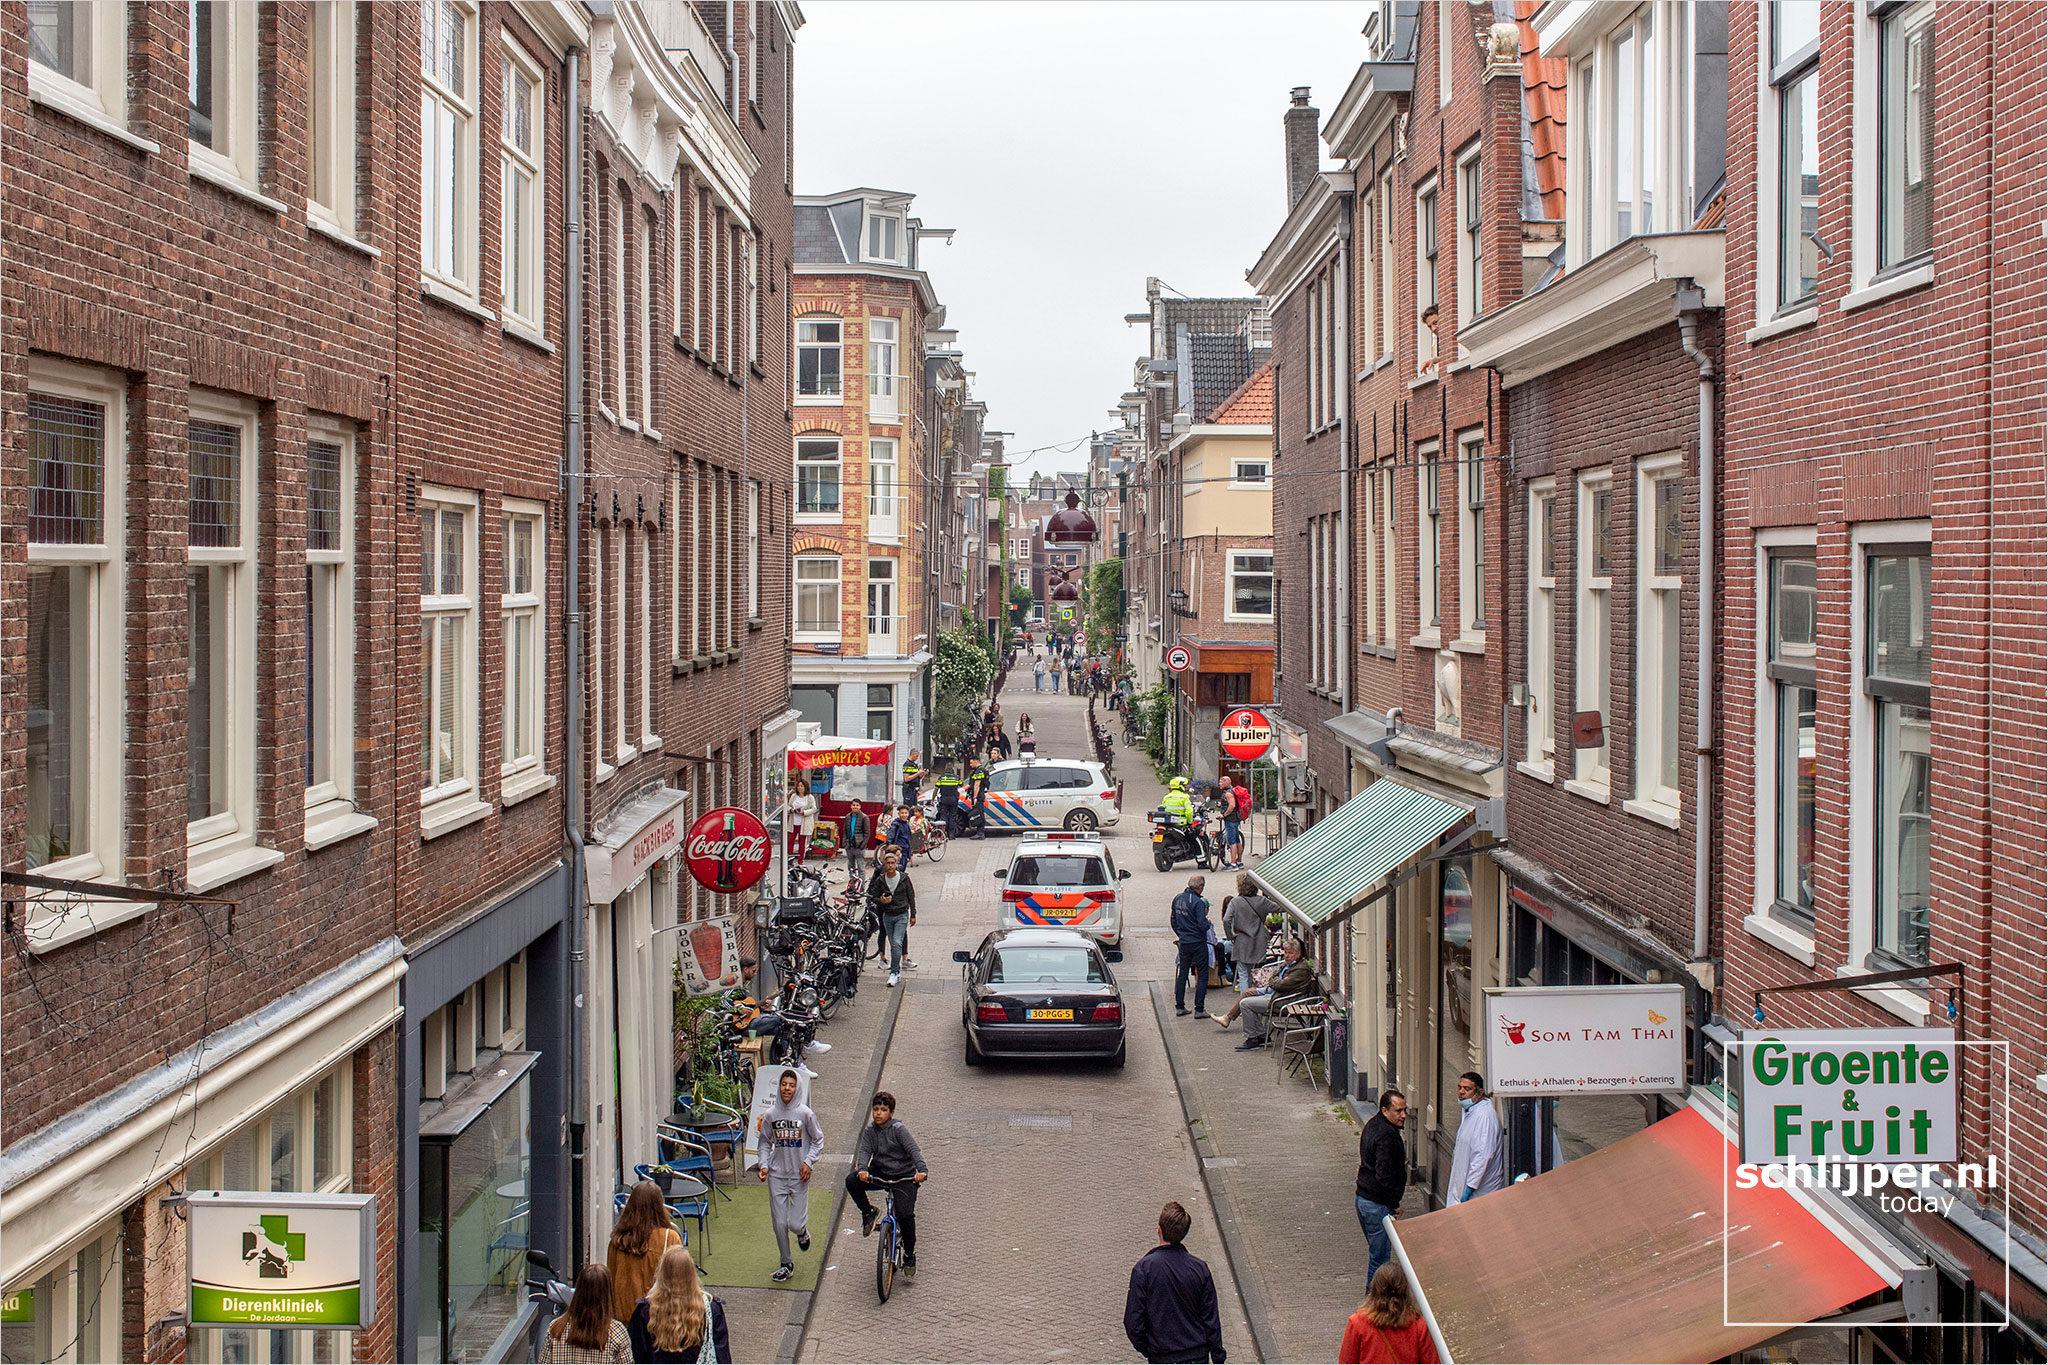 The Netherlands, Amsterdam 5 juni 2021